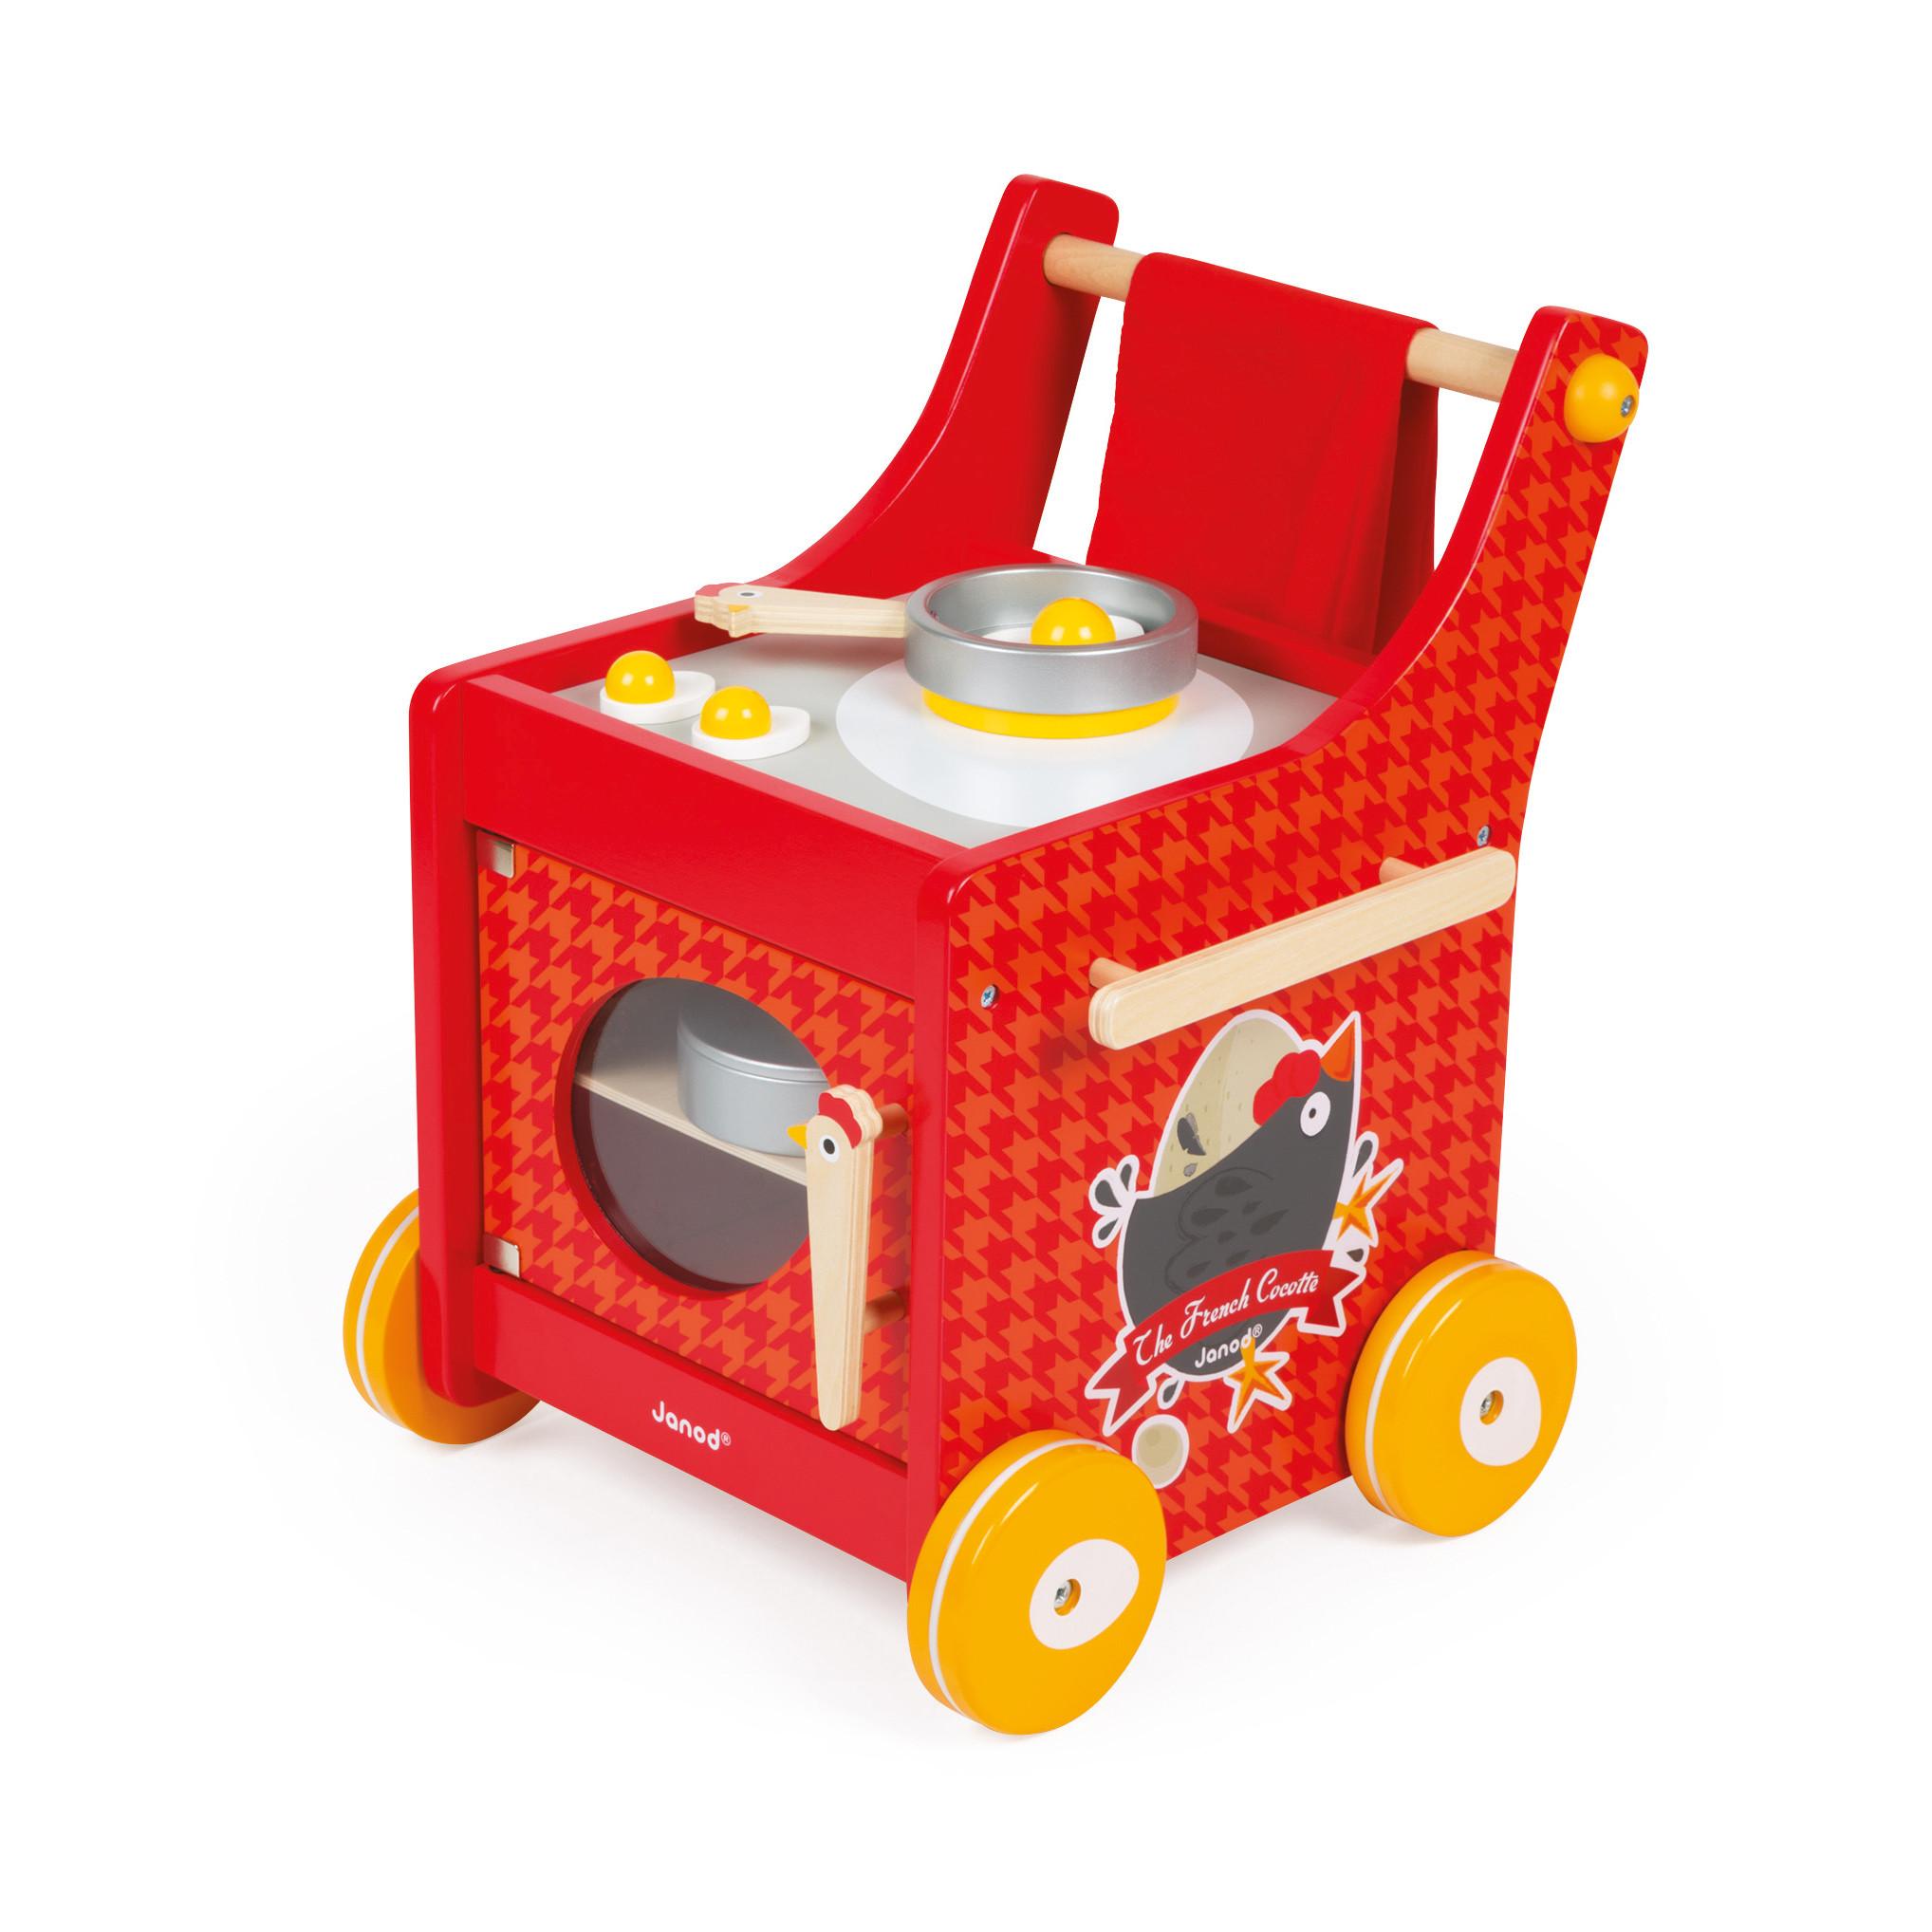 Juratoys Recalls Toy Trolleys Due to Impact Injury Hazard